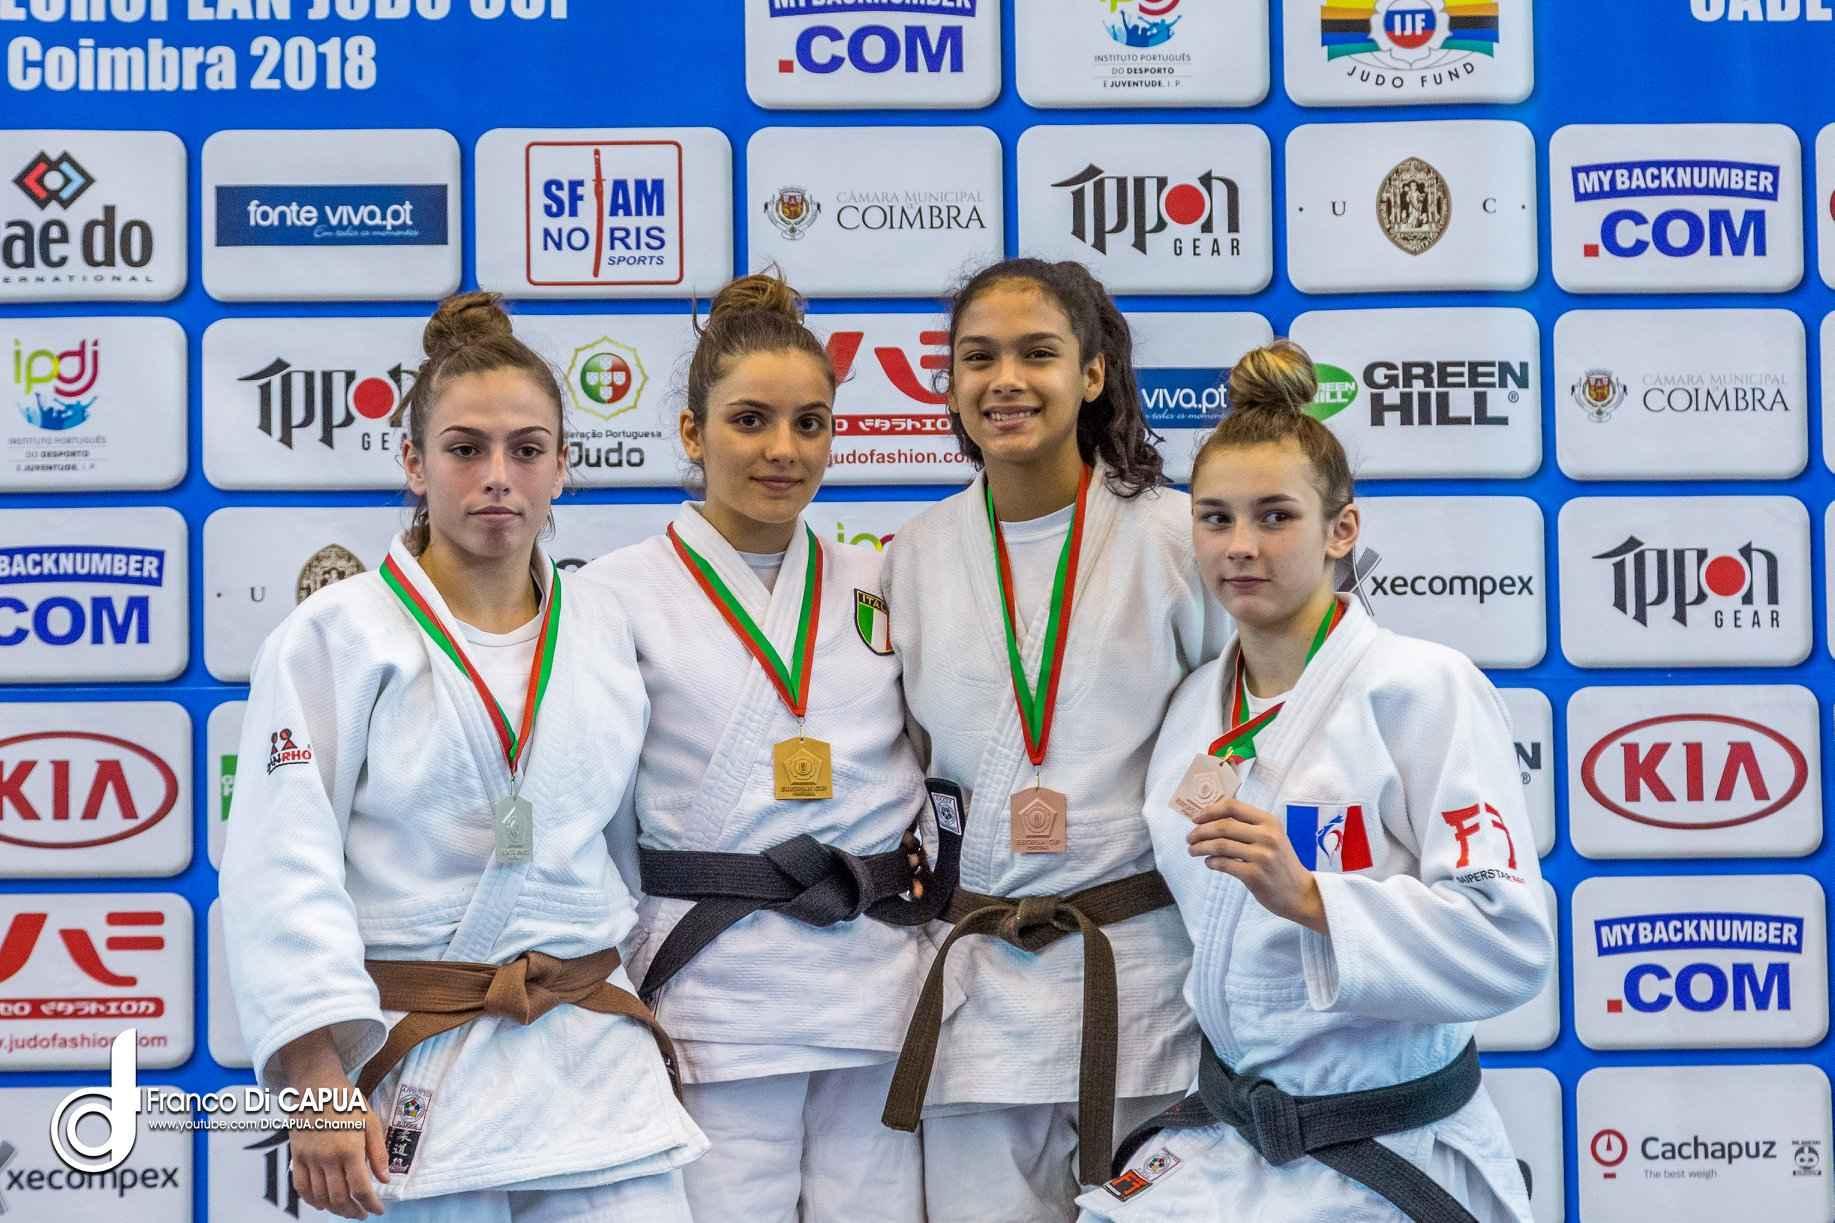 20180526_coimbrau18_fdc_podium_44